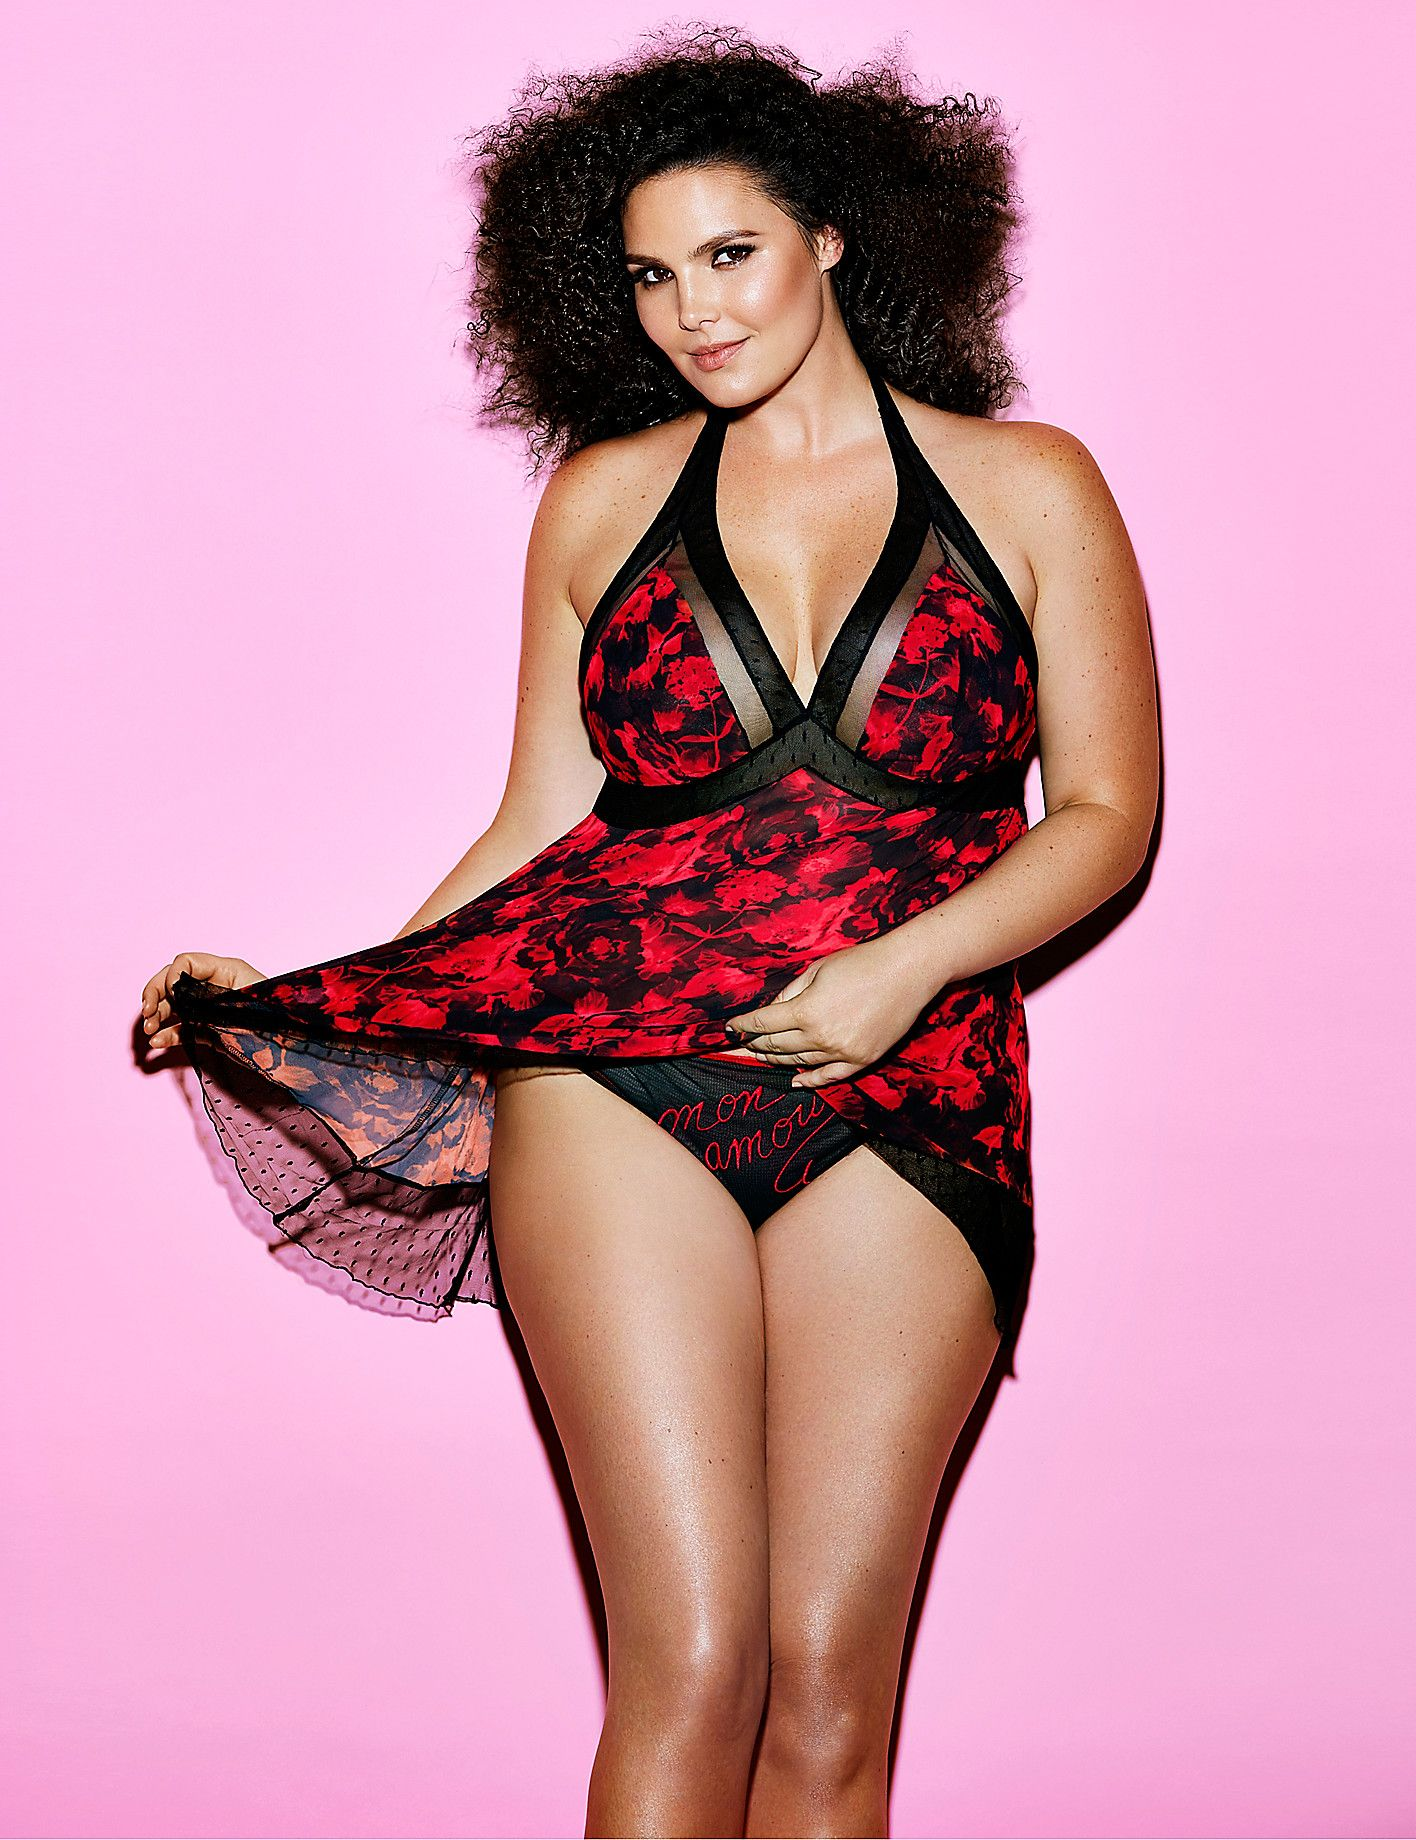 Bikini Leila Spilman nude (44 photos), Ass, Hot, Twitter, in bikini 2006